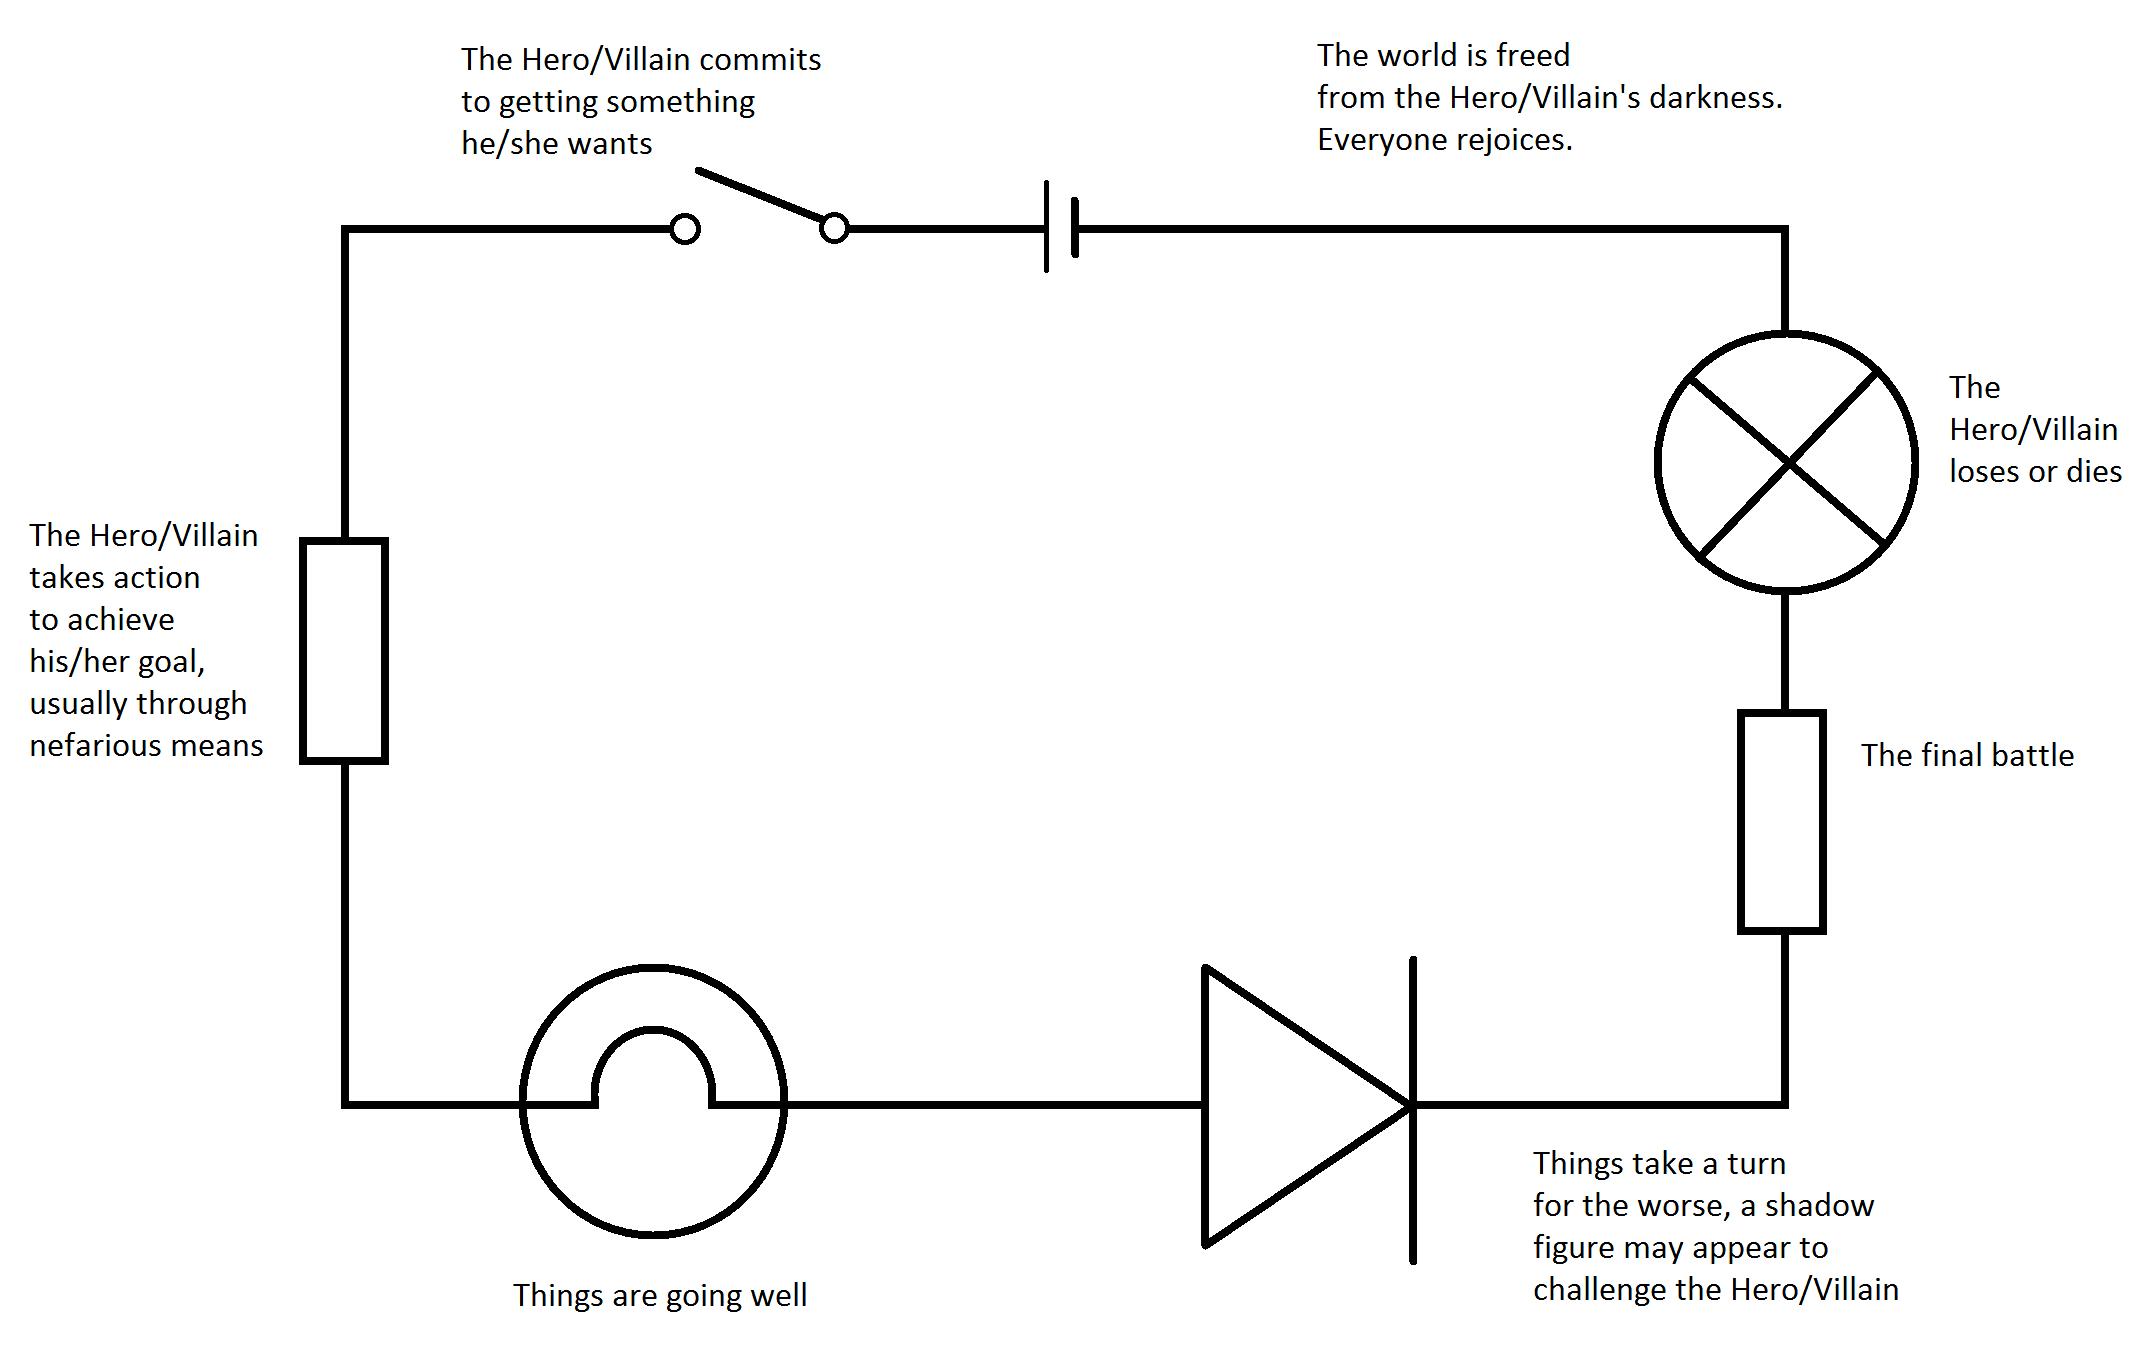 New House Electrical Wiring Basics Diagram Wiringdiagram Diagramming Diagramm Visuals Visualisation G Electrical Circuit Diagram Circuit Diagram Diagram